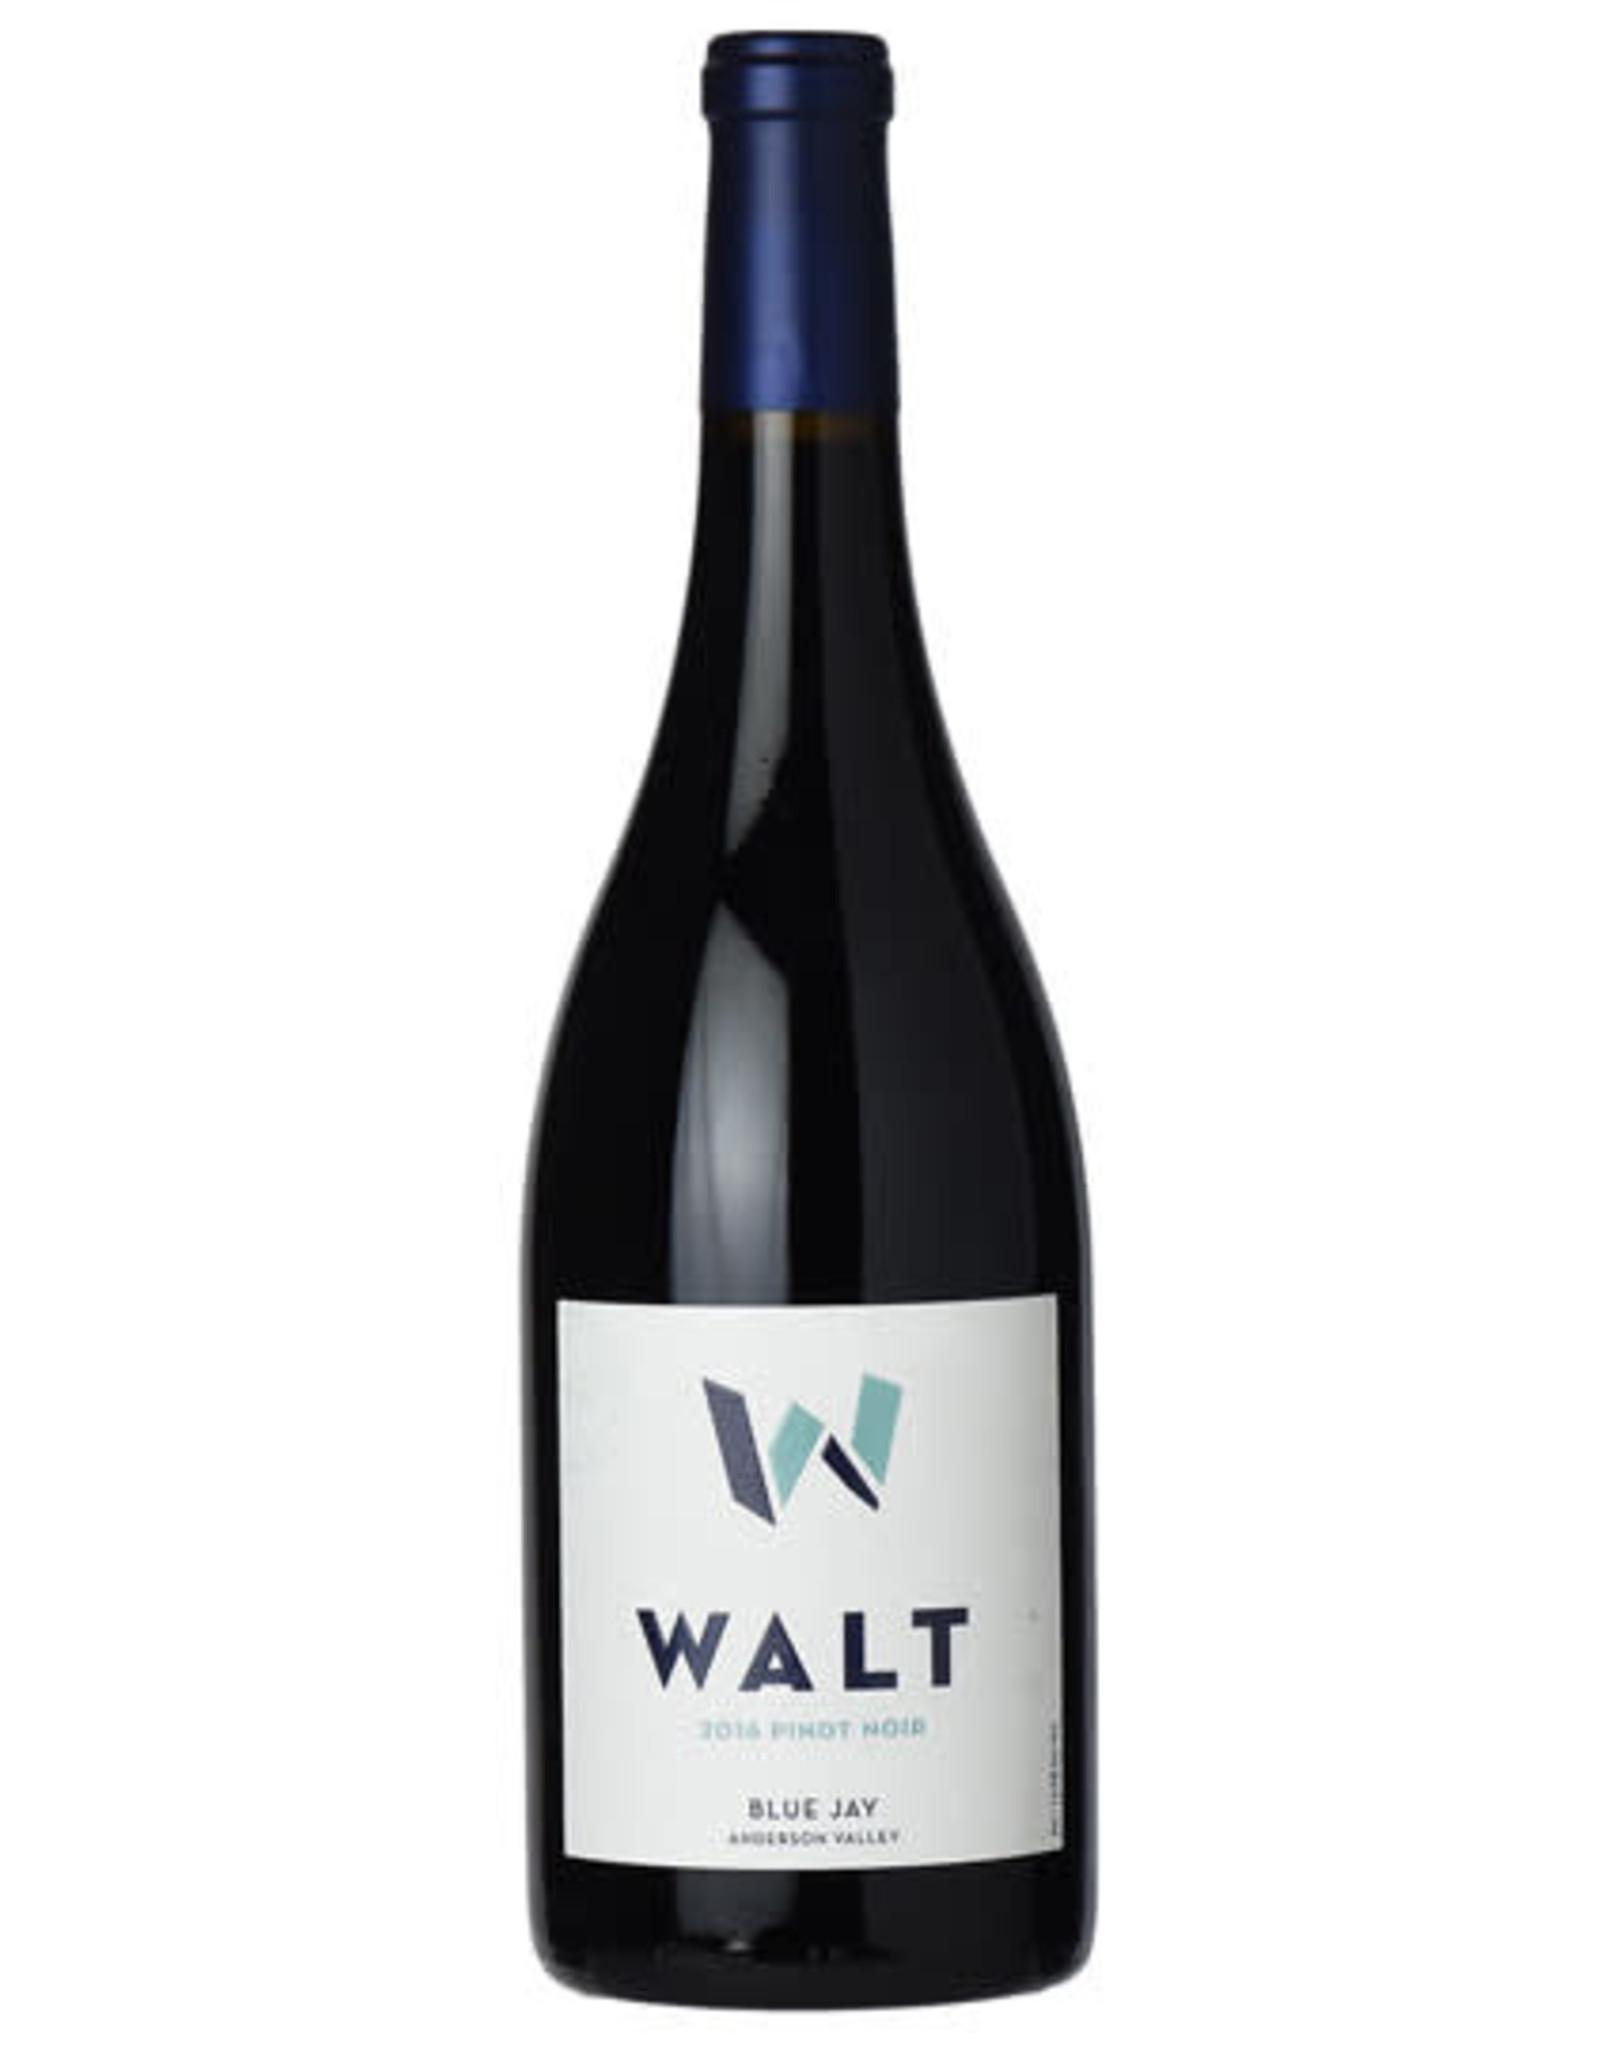 Walt Blue Jay Anderson Valley Pinot Noir 2018